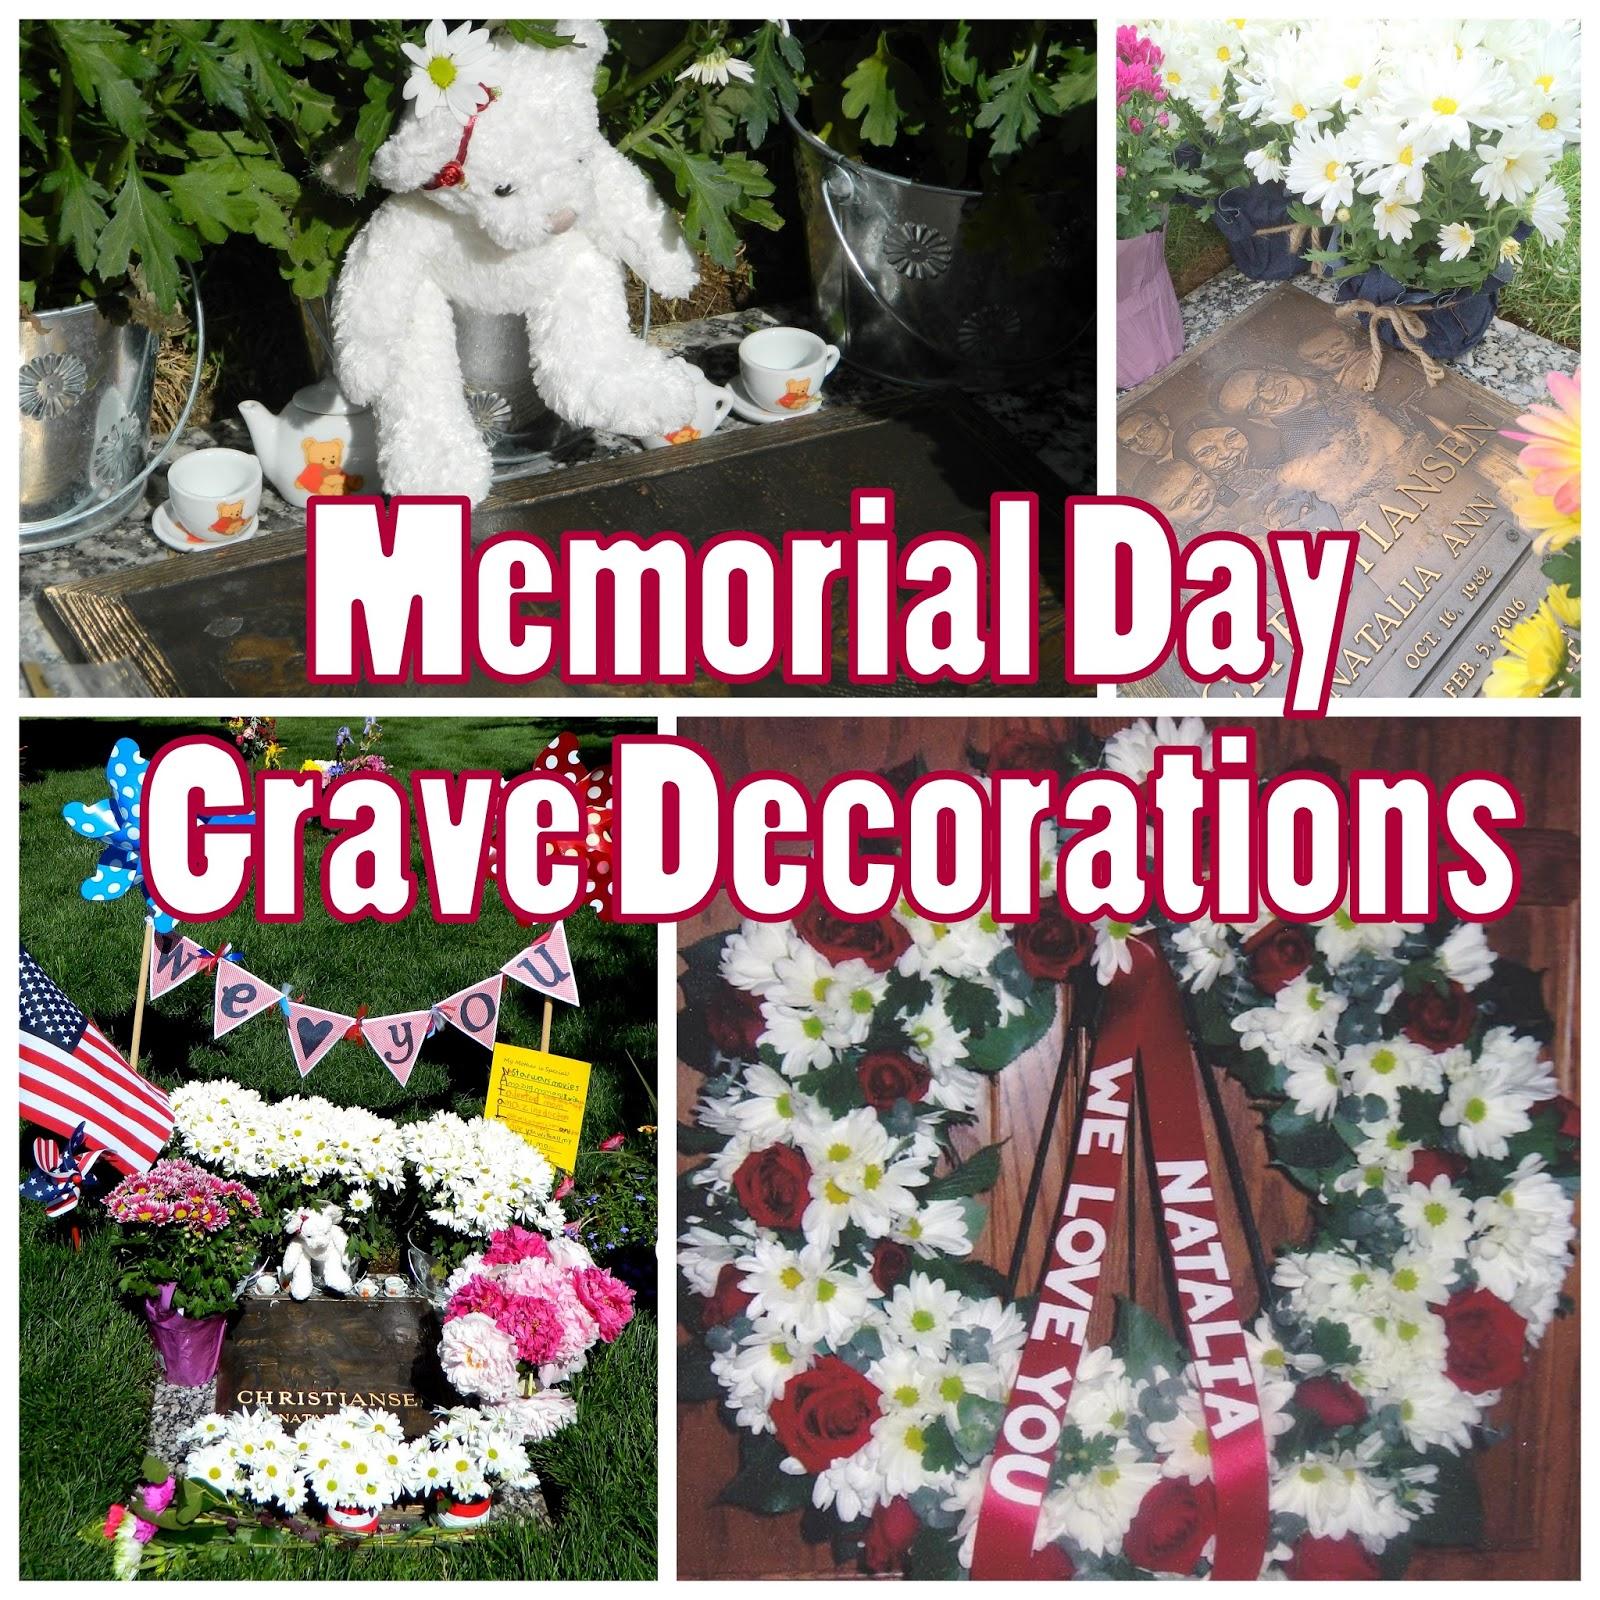 CreateJoy2Day: Memorial Day